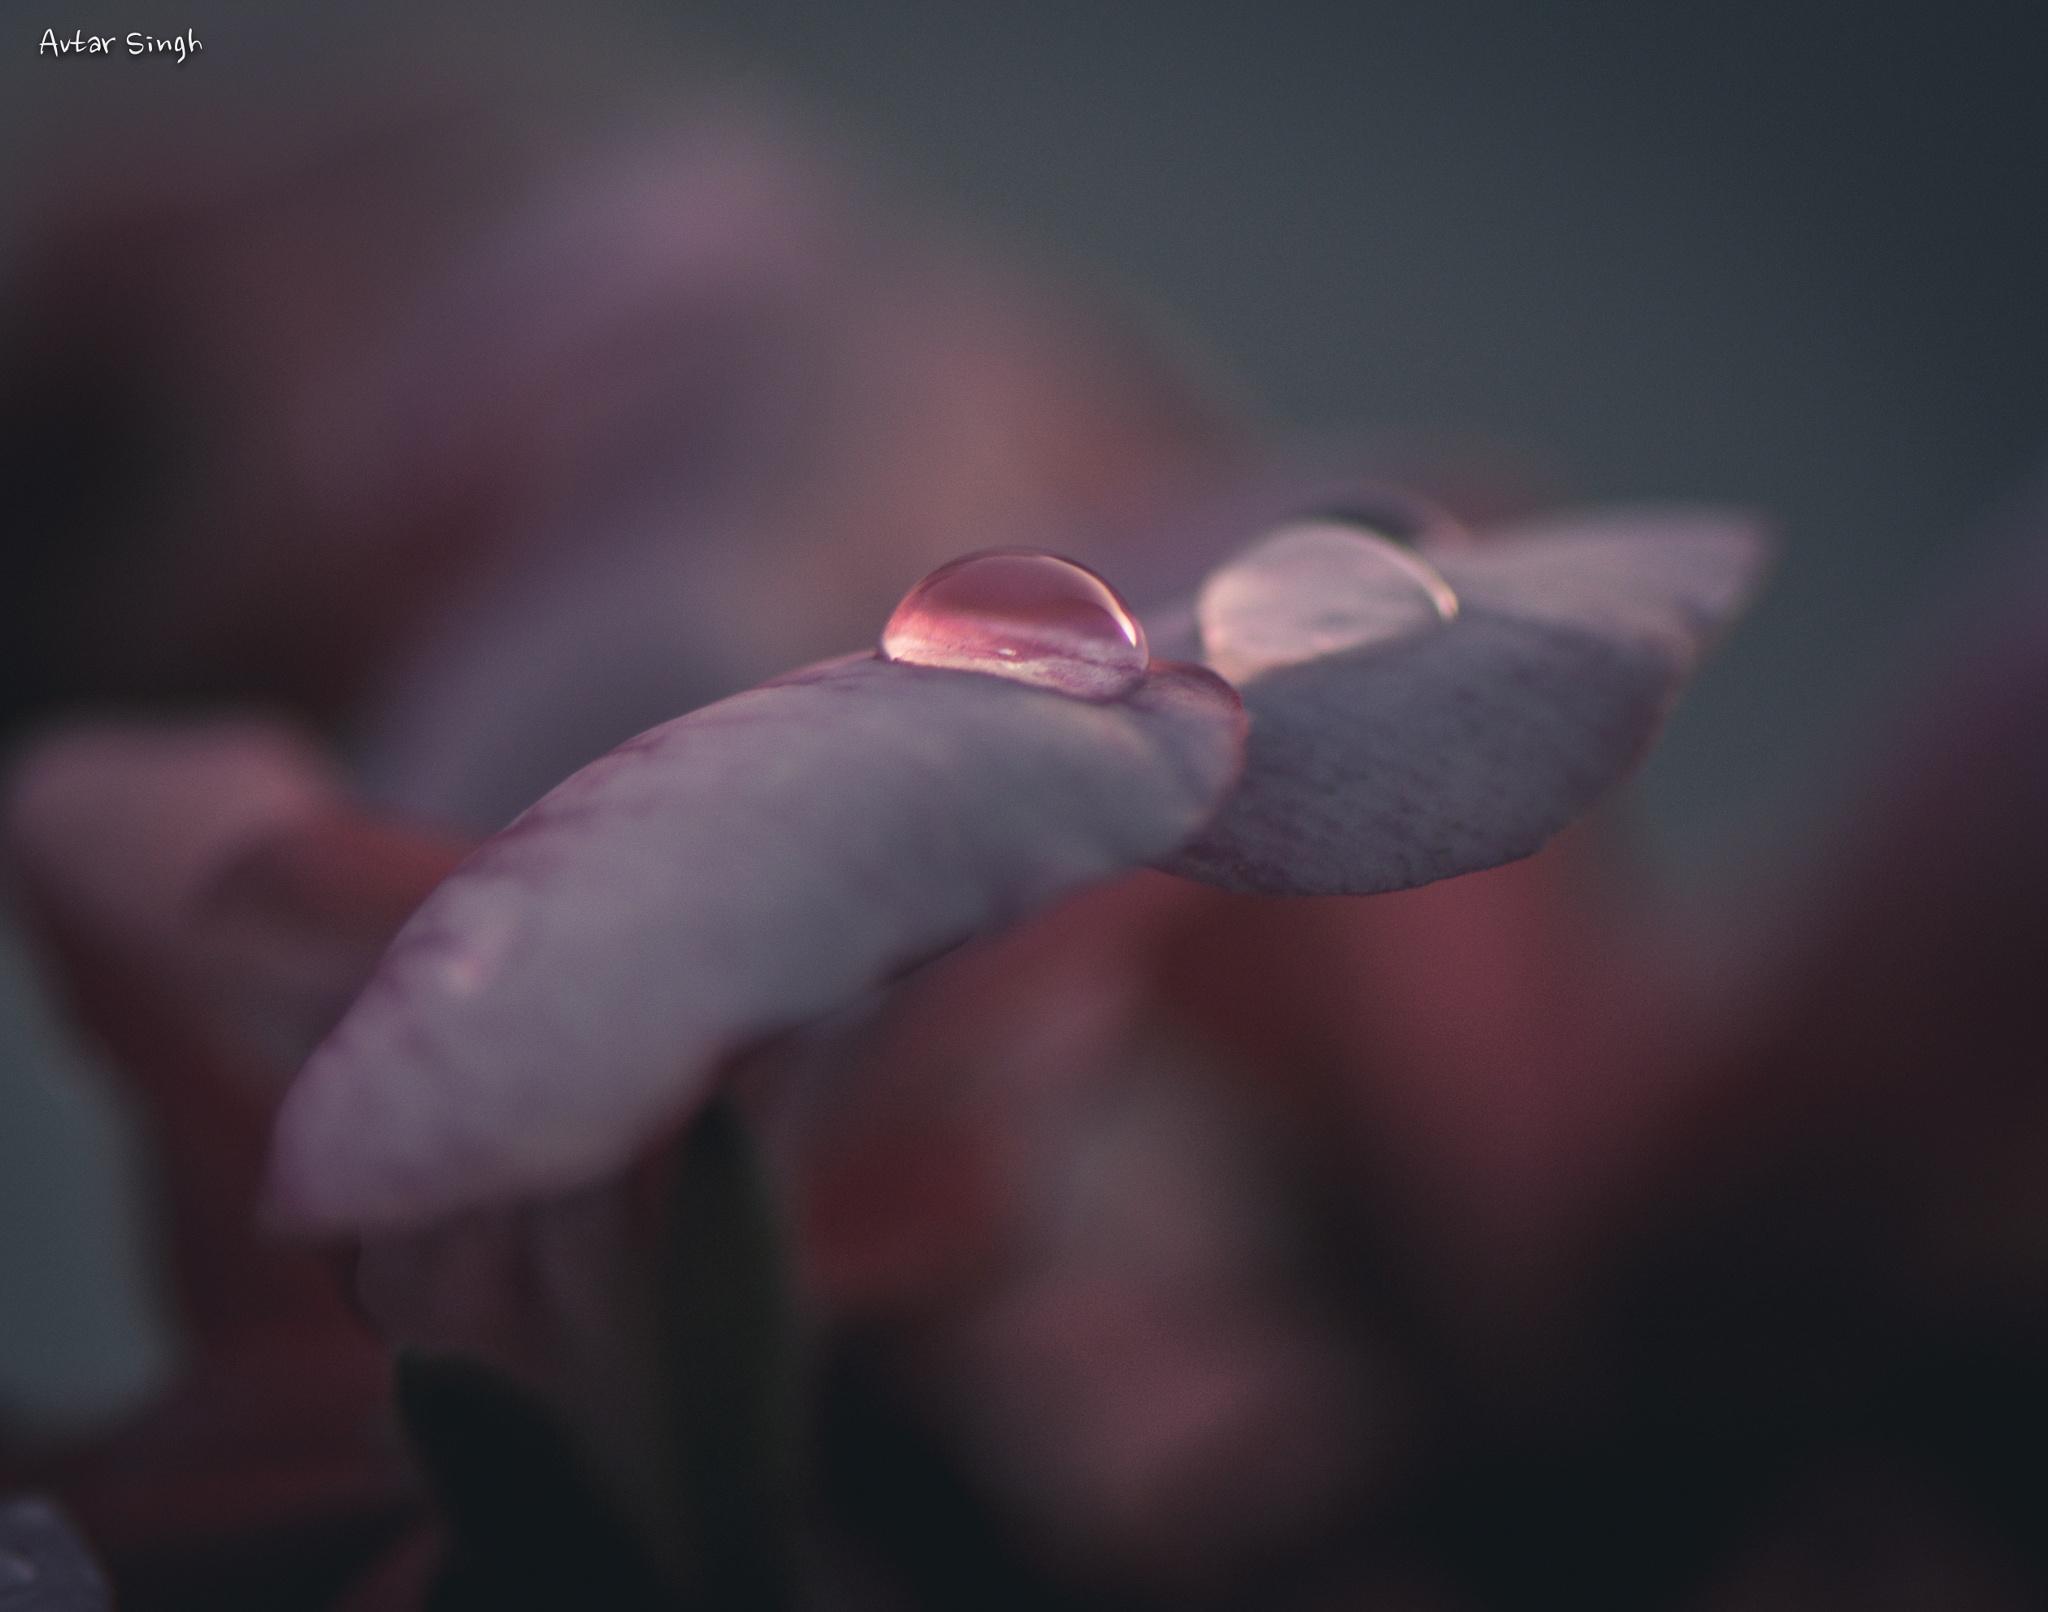 Twinkling Diamond by Avtar Singh